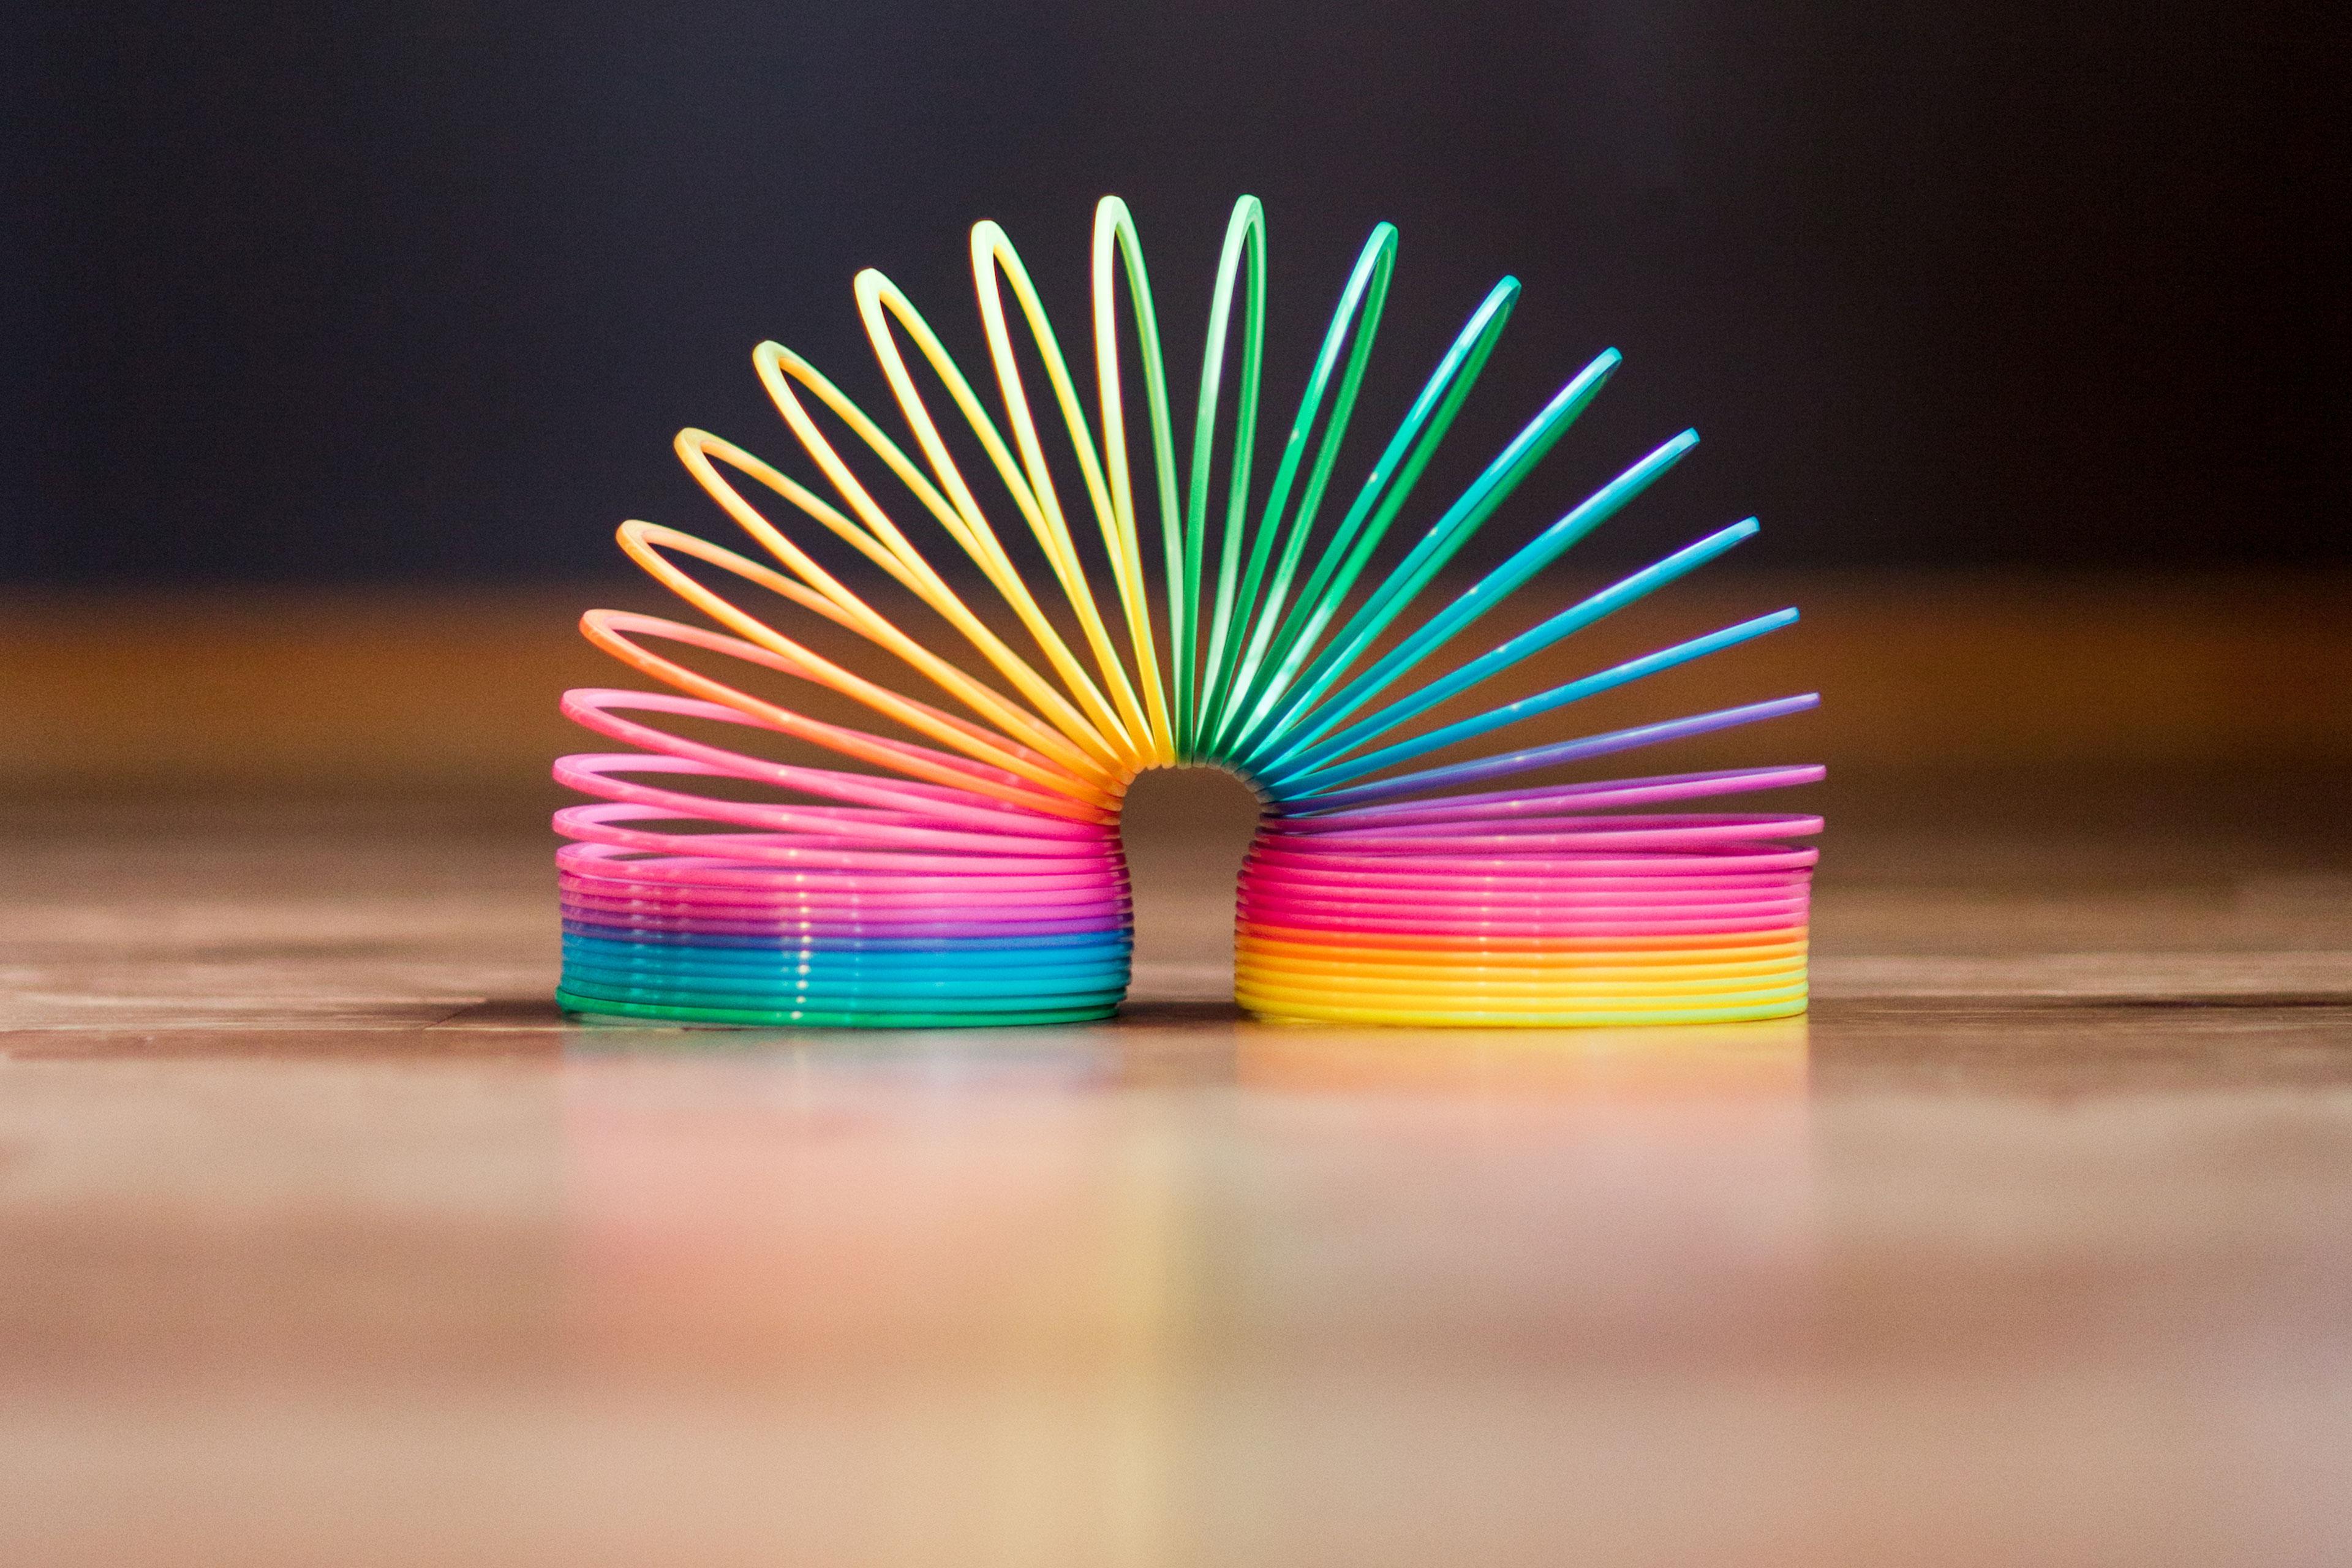 EY - Brightly coloured slinky